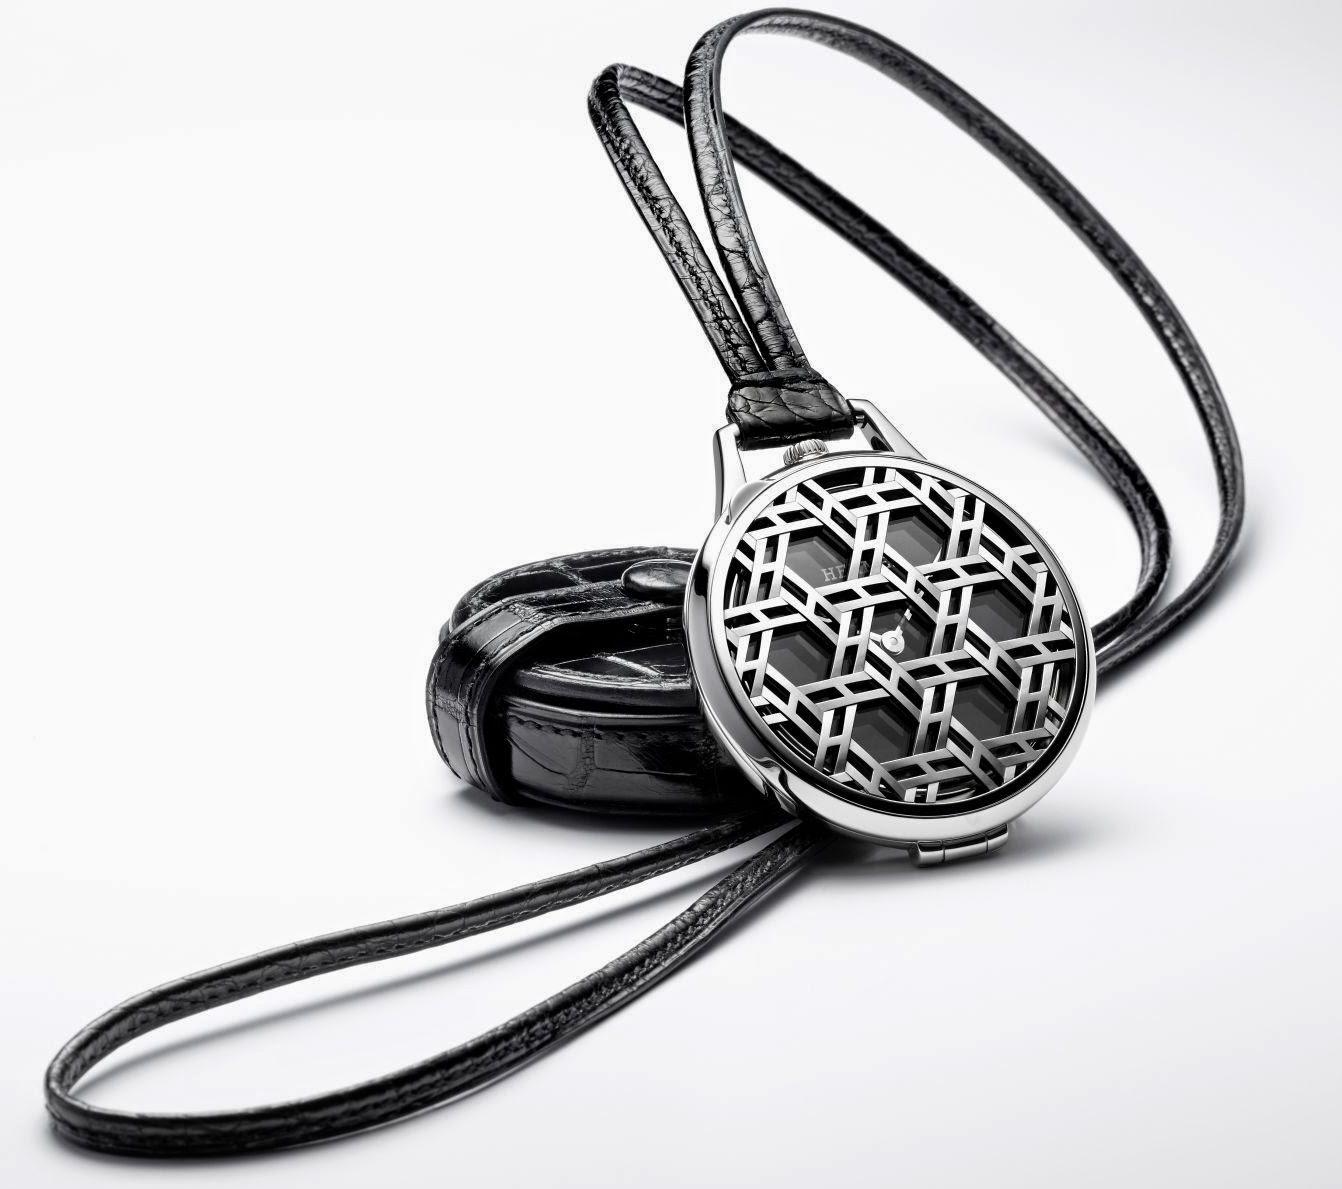 Hermès - Slim d'Hermès Pocket So H watch